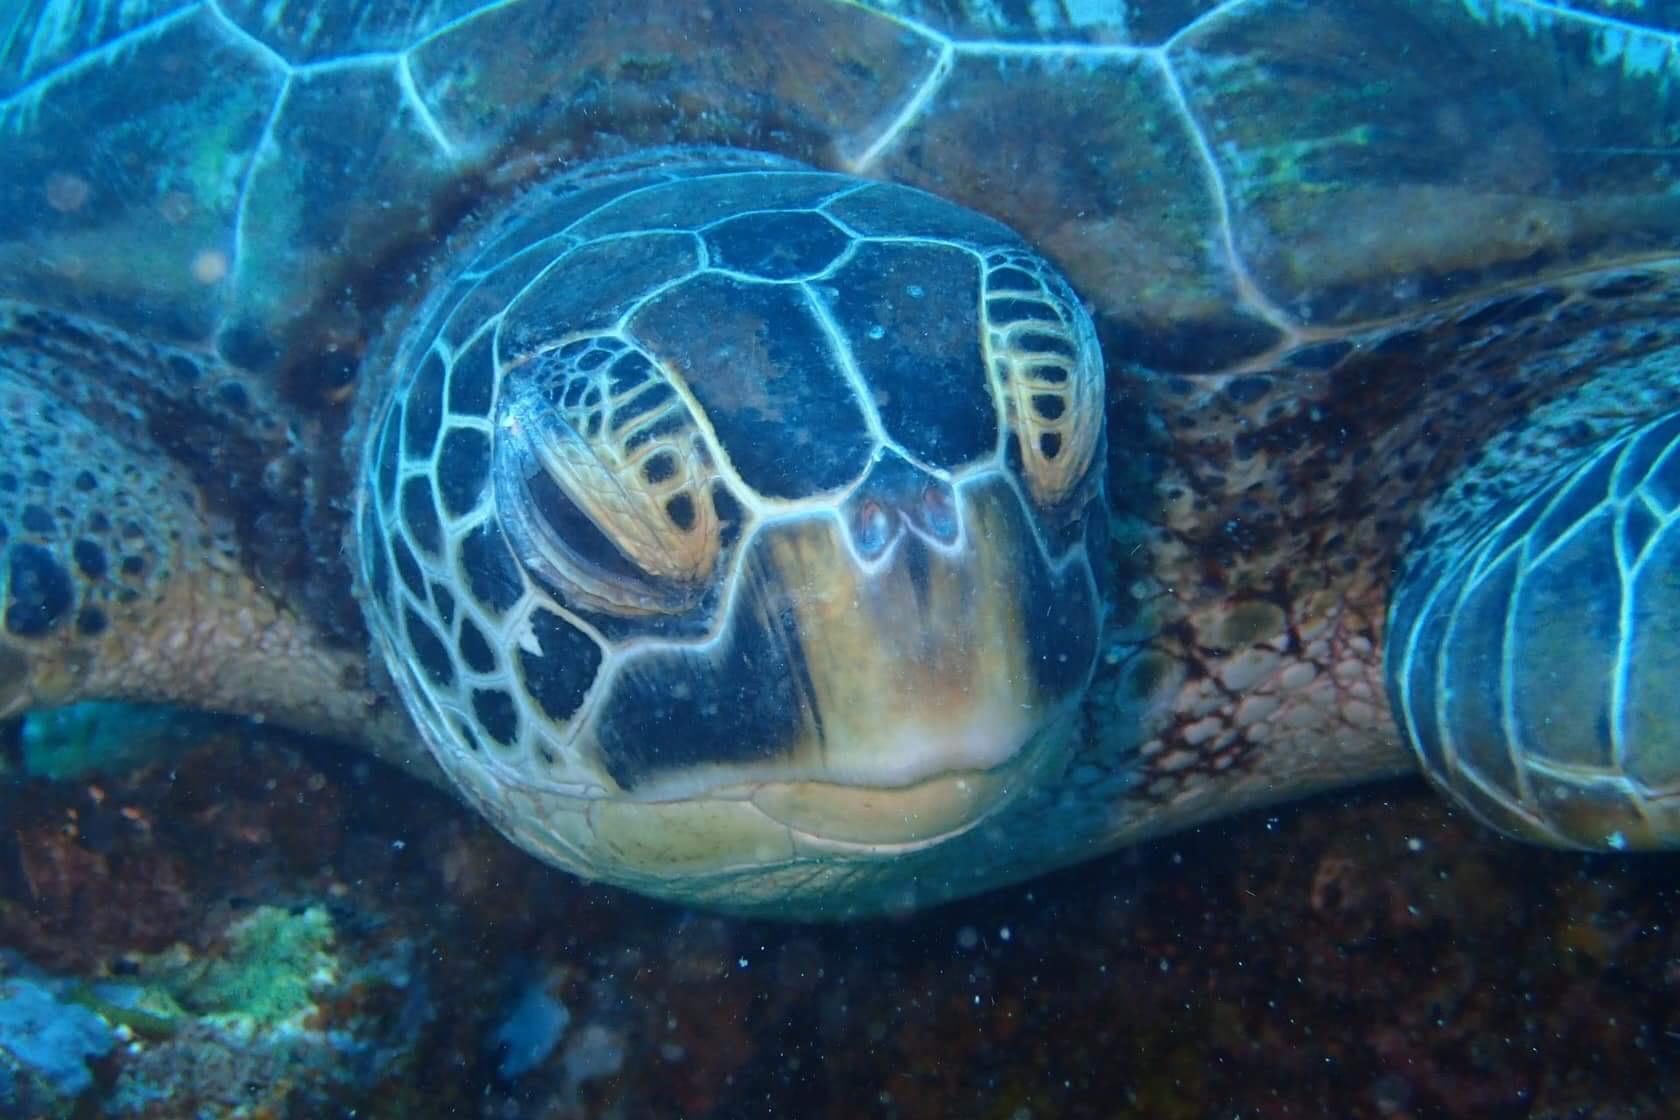 http://blog.cebu-oh.com/local/2018/08/photo/GoodDive_Turtle.JPG